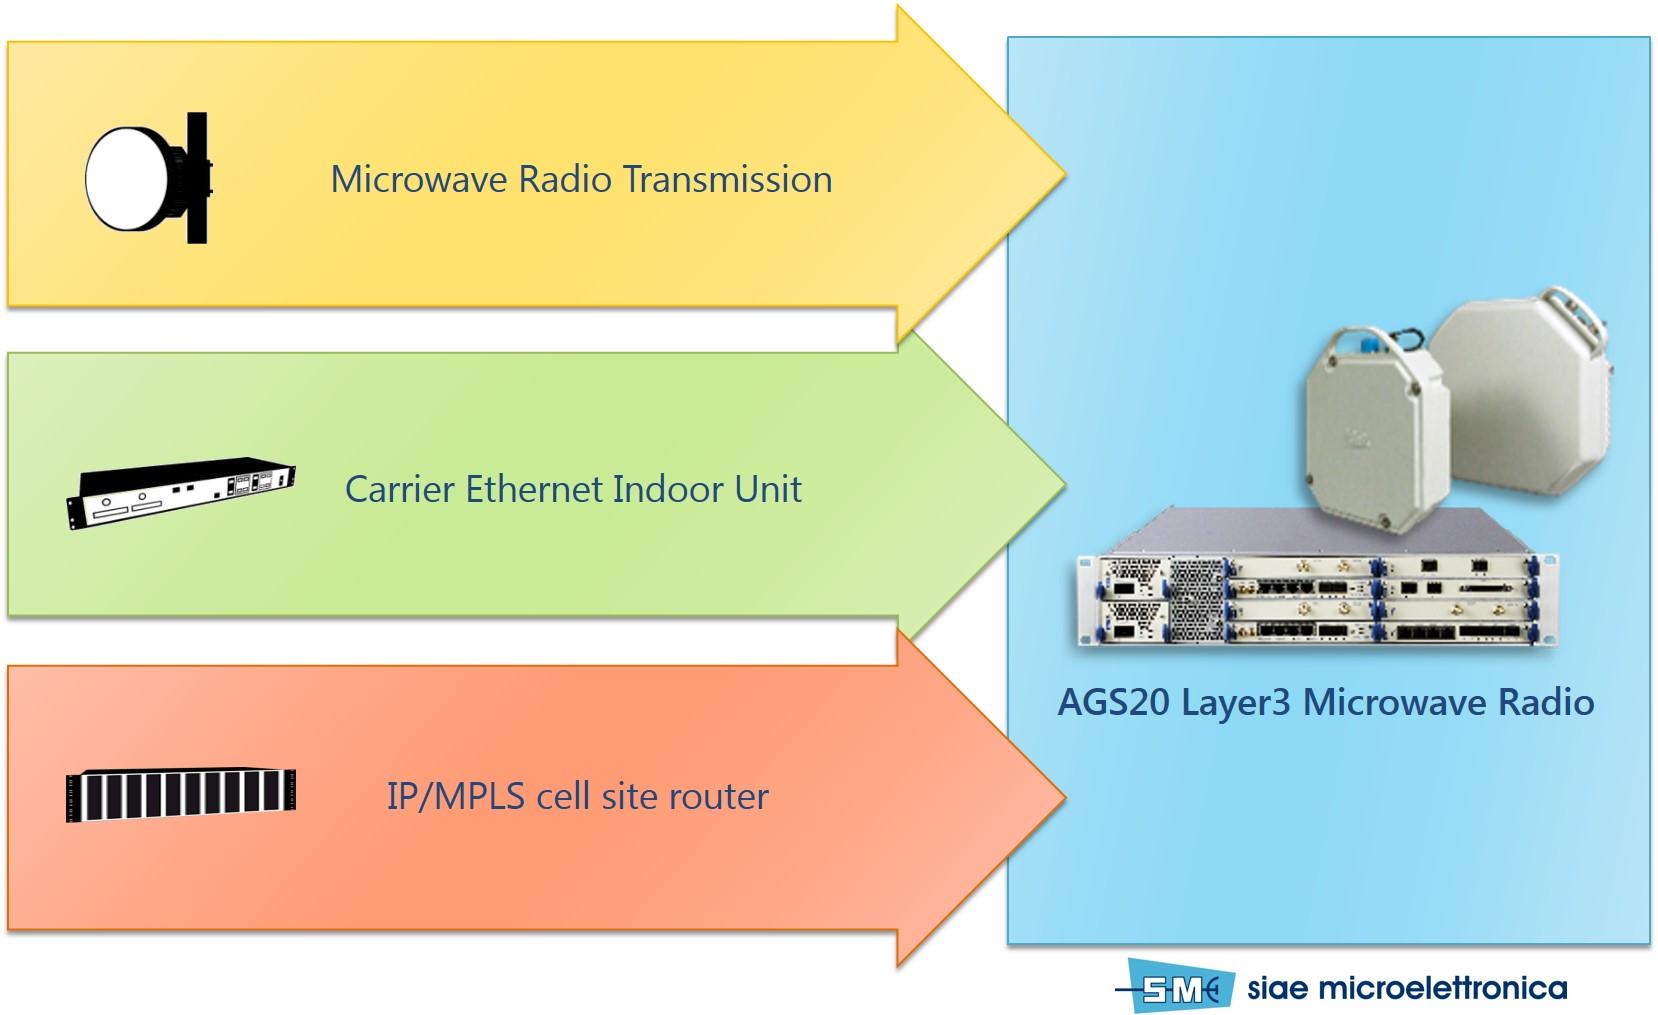 Layer3 Microwave Radio